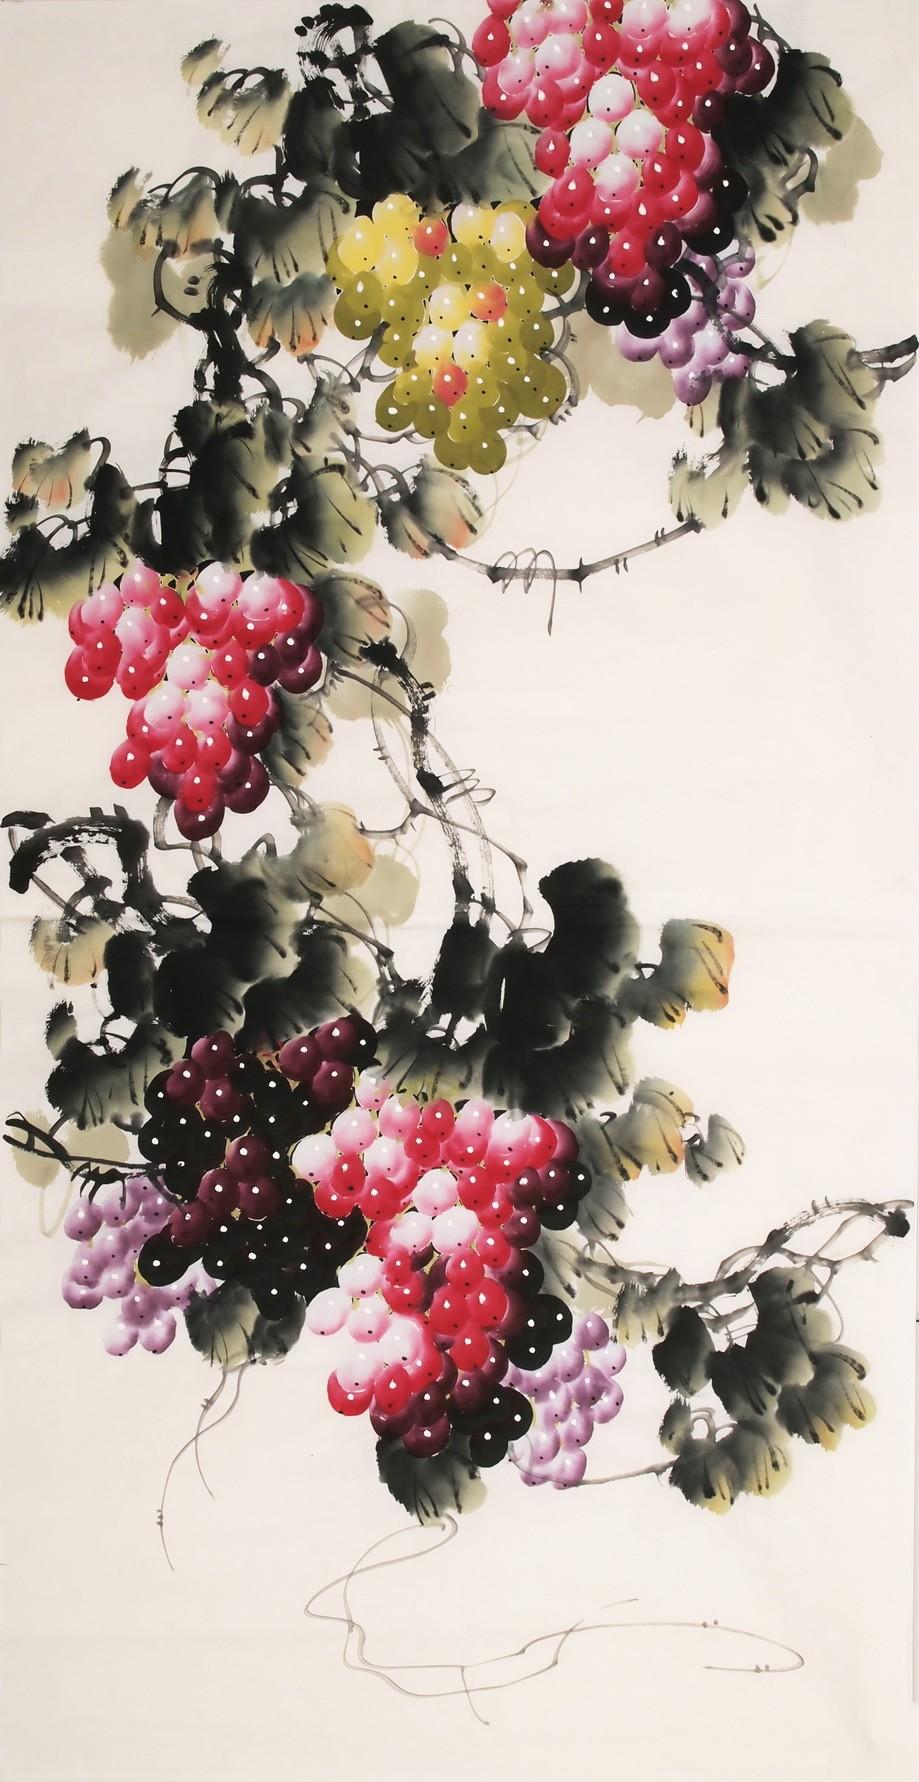 Grapes - CNAG000515